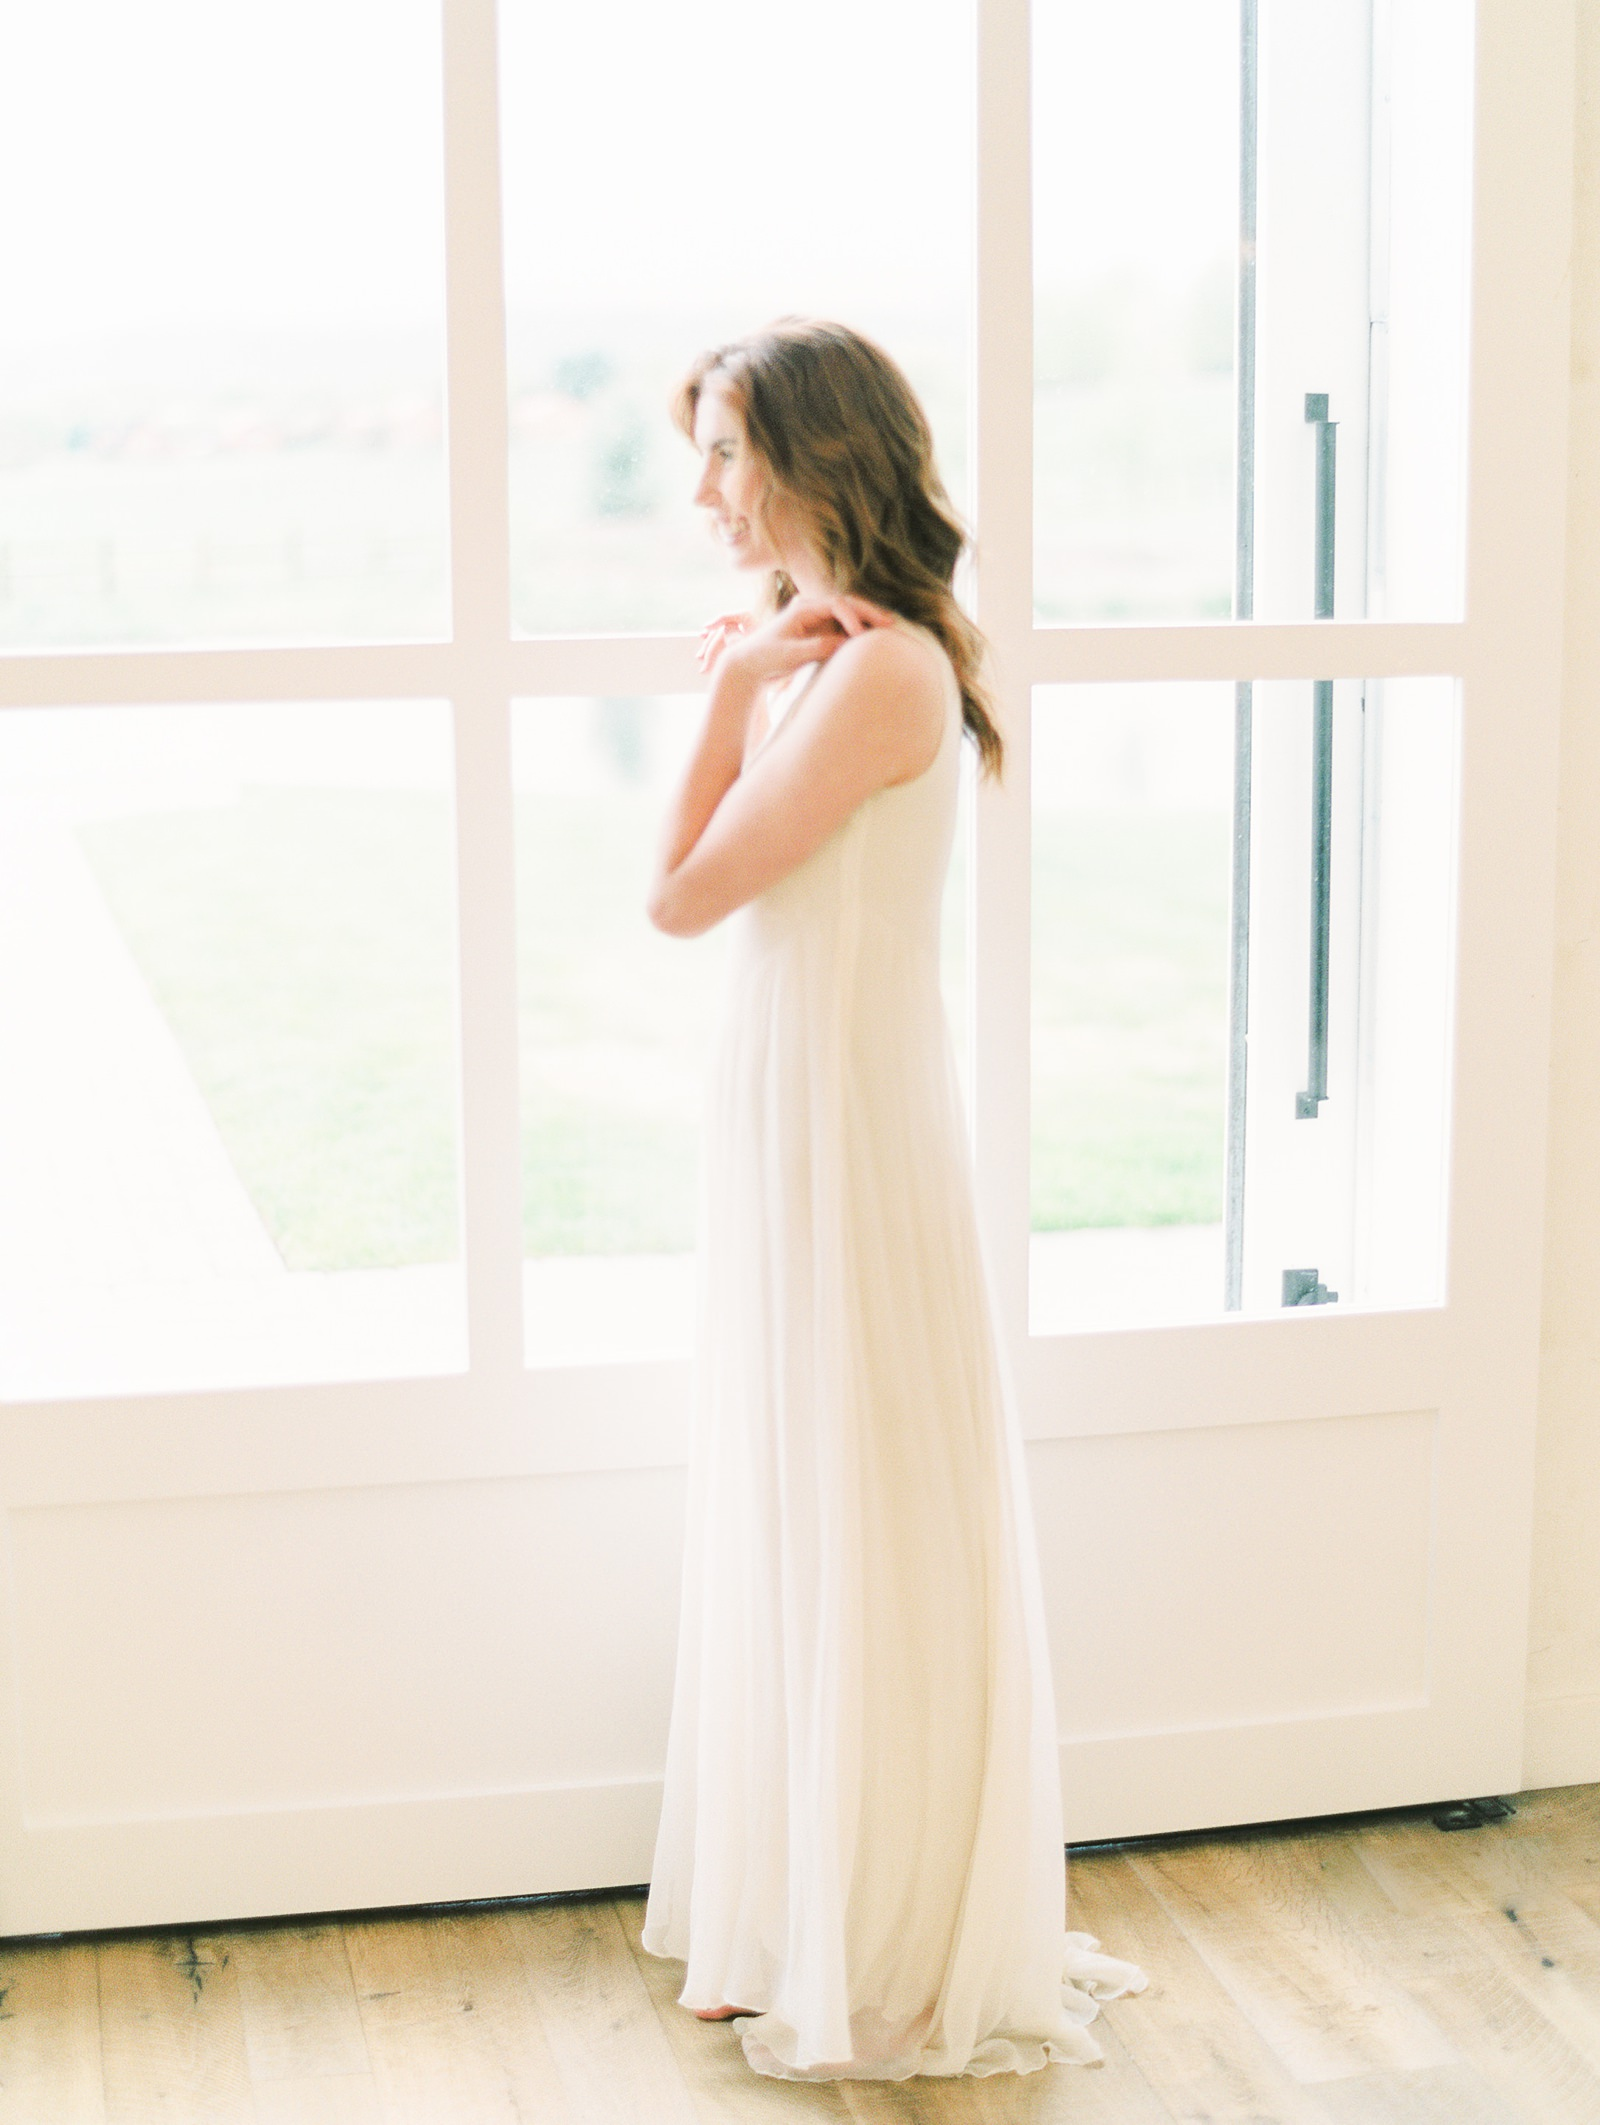 Heber Valley Natural Organic Wedding Inspiration at River Bottoms Ranch, Utah wedding photography, simple white flowy wedding dress ballerina bride window light